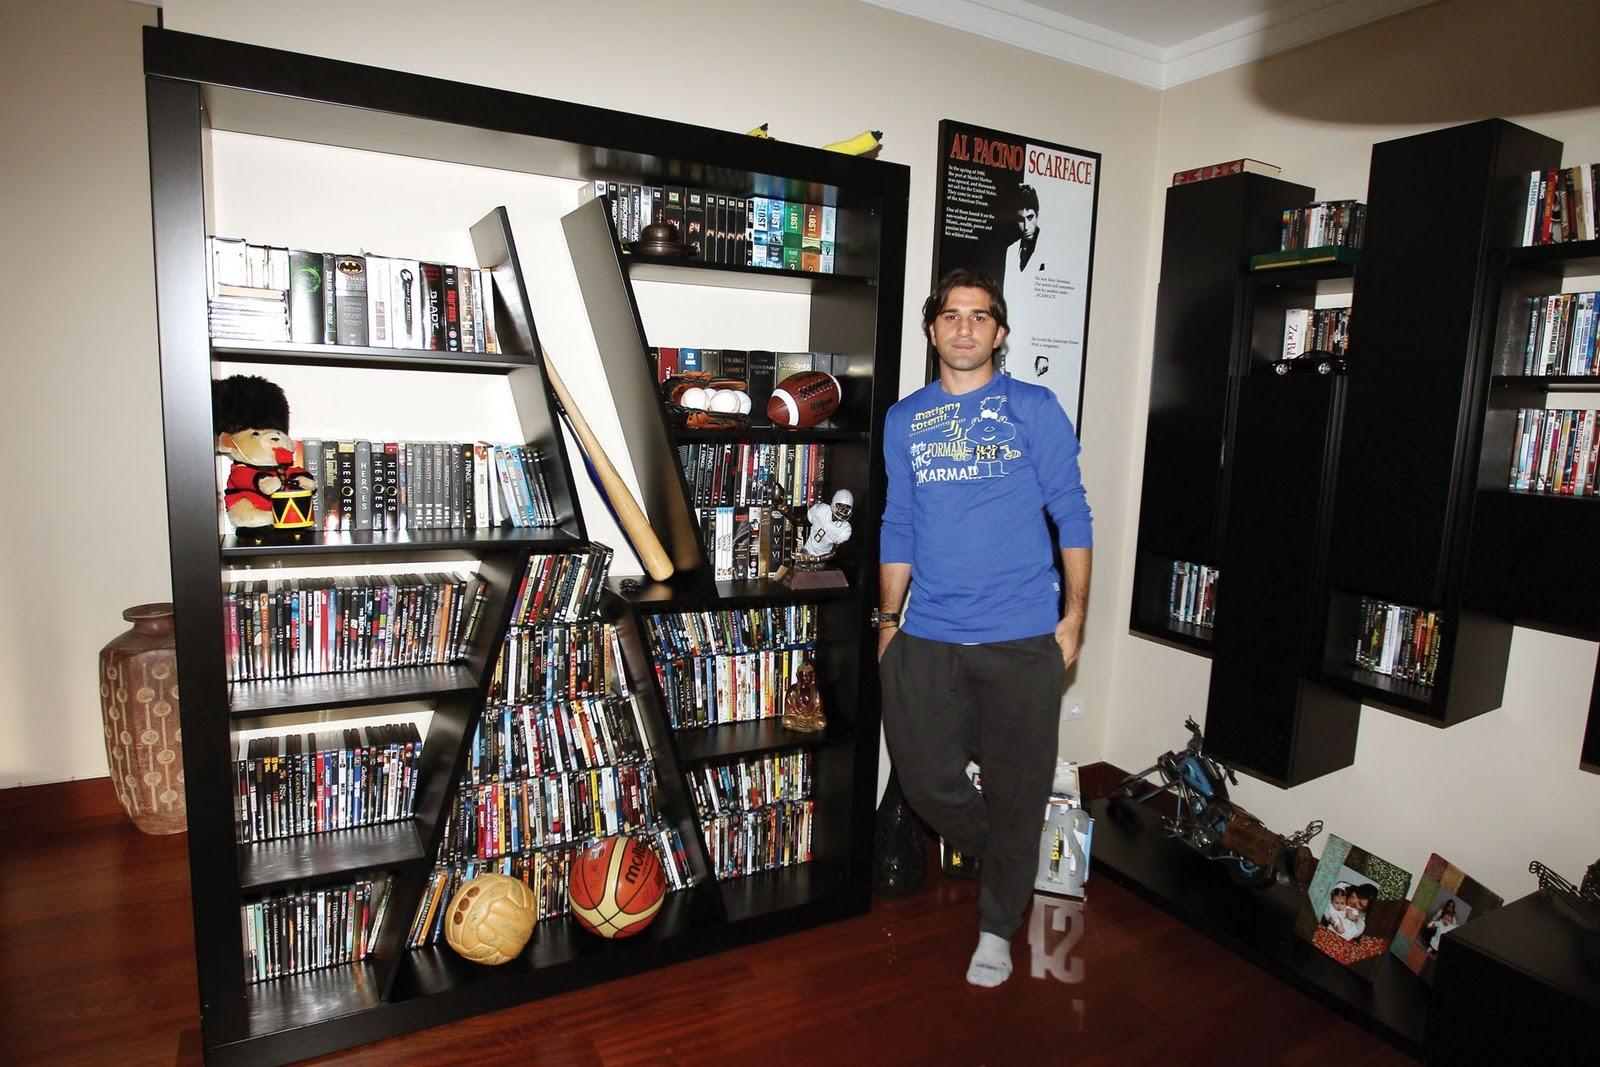 http://3.bp.blogspot.com/-YLQ_IbjtgHw/TrJ_j0DIOyI/AAAAAAAAGZk/juwtsK14xTg/s1600/ugurboral1.jpg